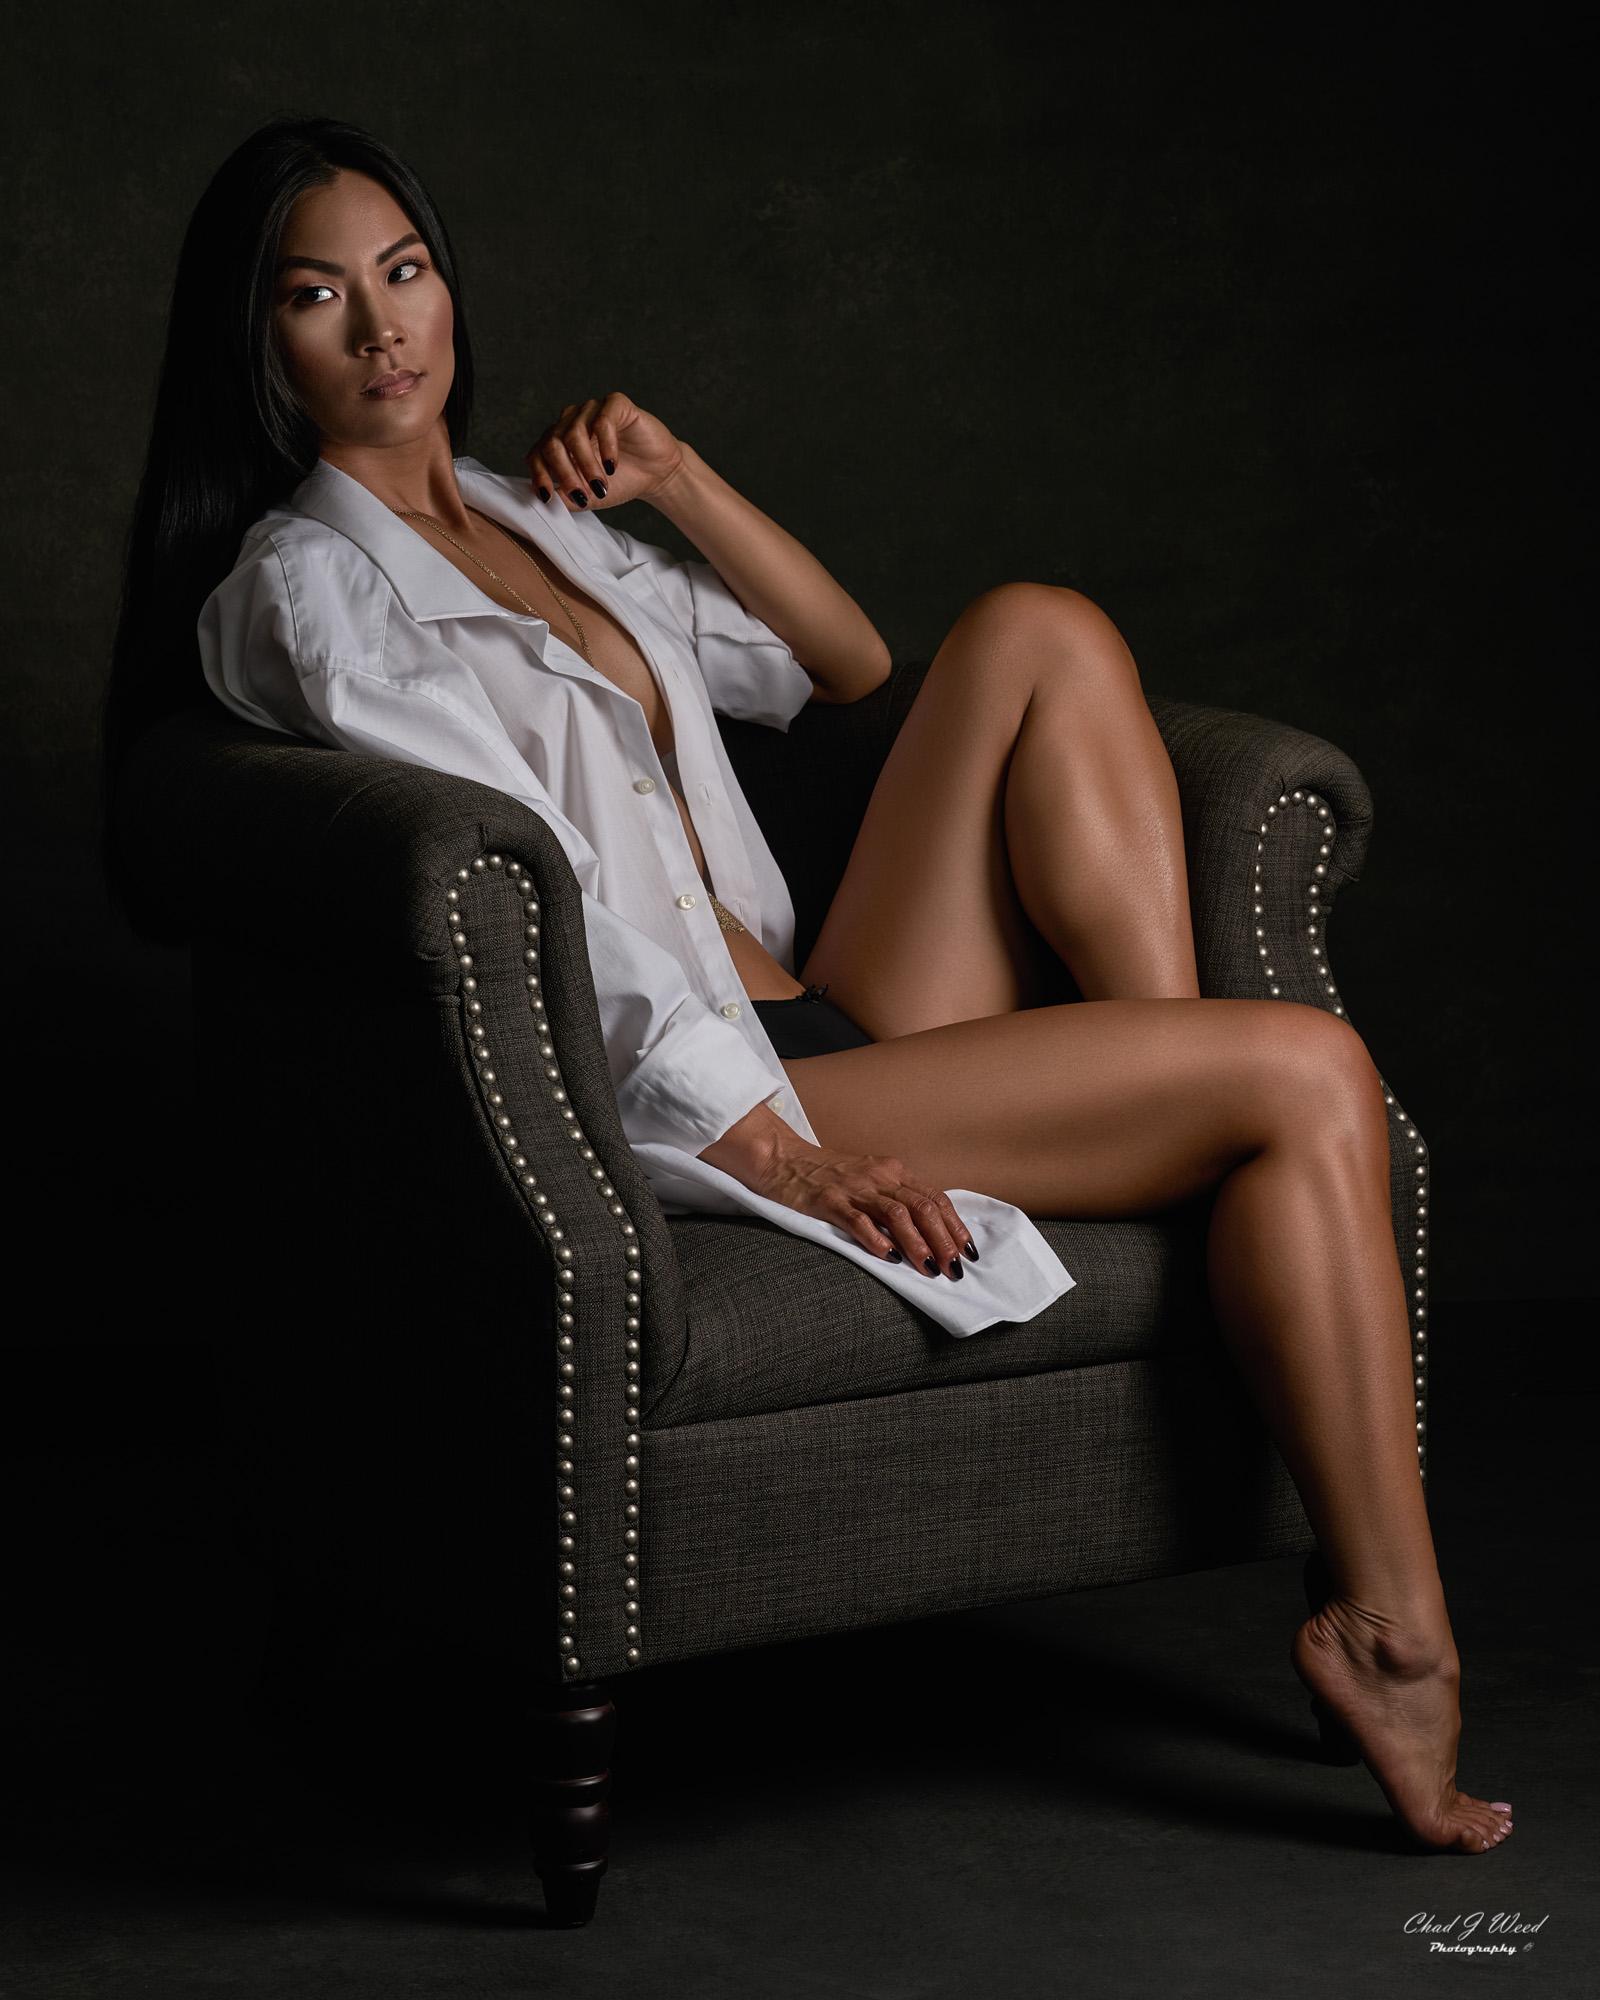 Arizona Fashion Portrait Photographer Chad Weed - Fitness Model Lora